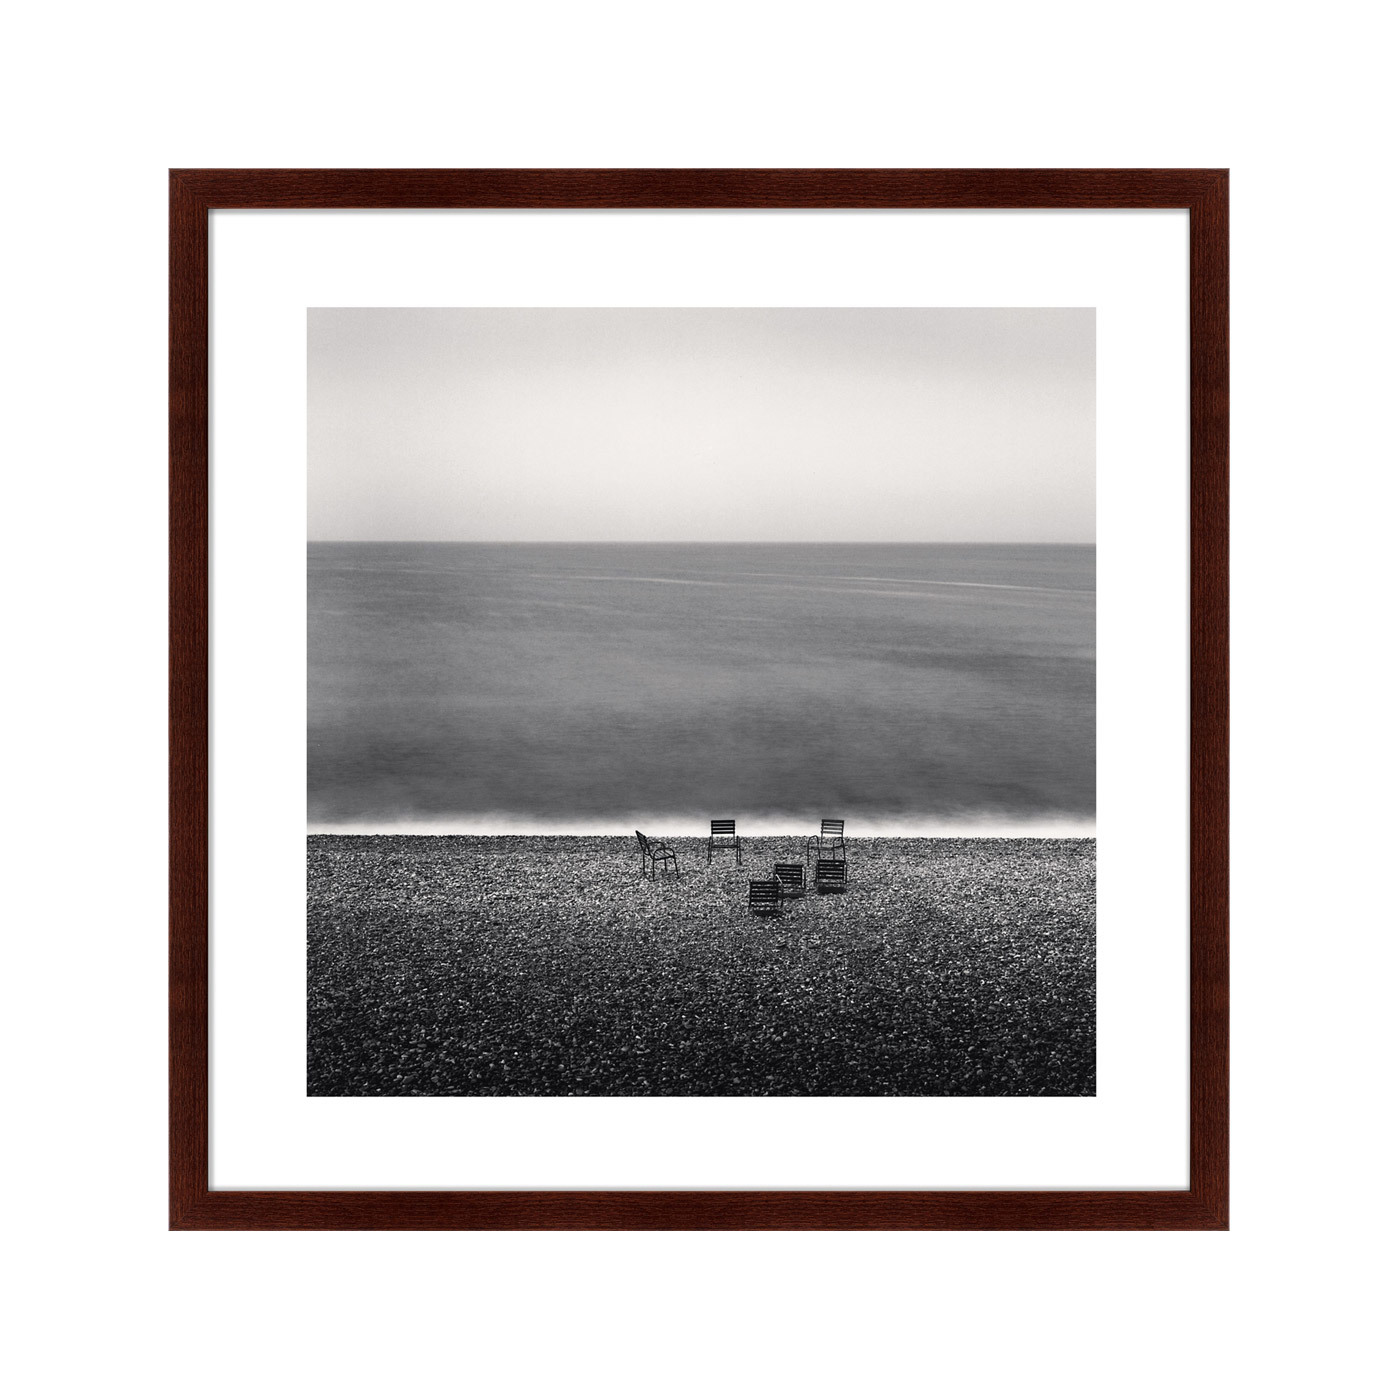 {} Картины в Квартиру Картина Sea Shore (79х79 см) картины в квартиру картина вода деревья утро 102х130 см